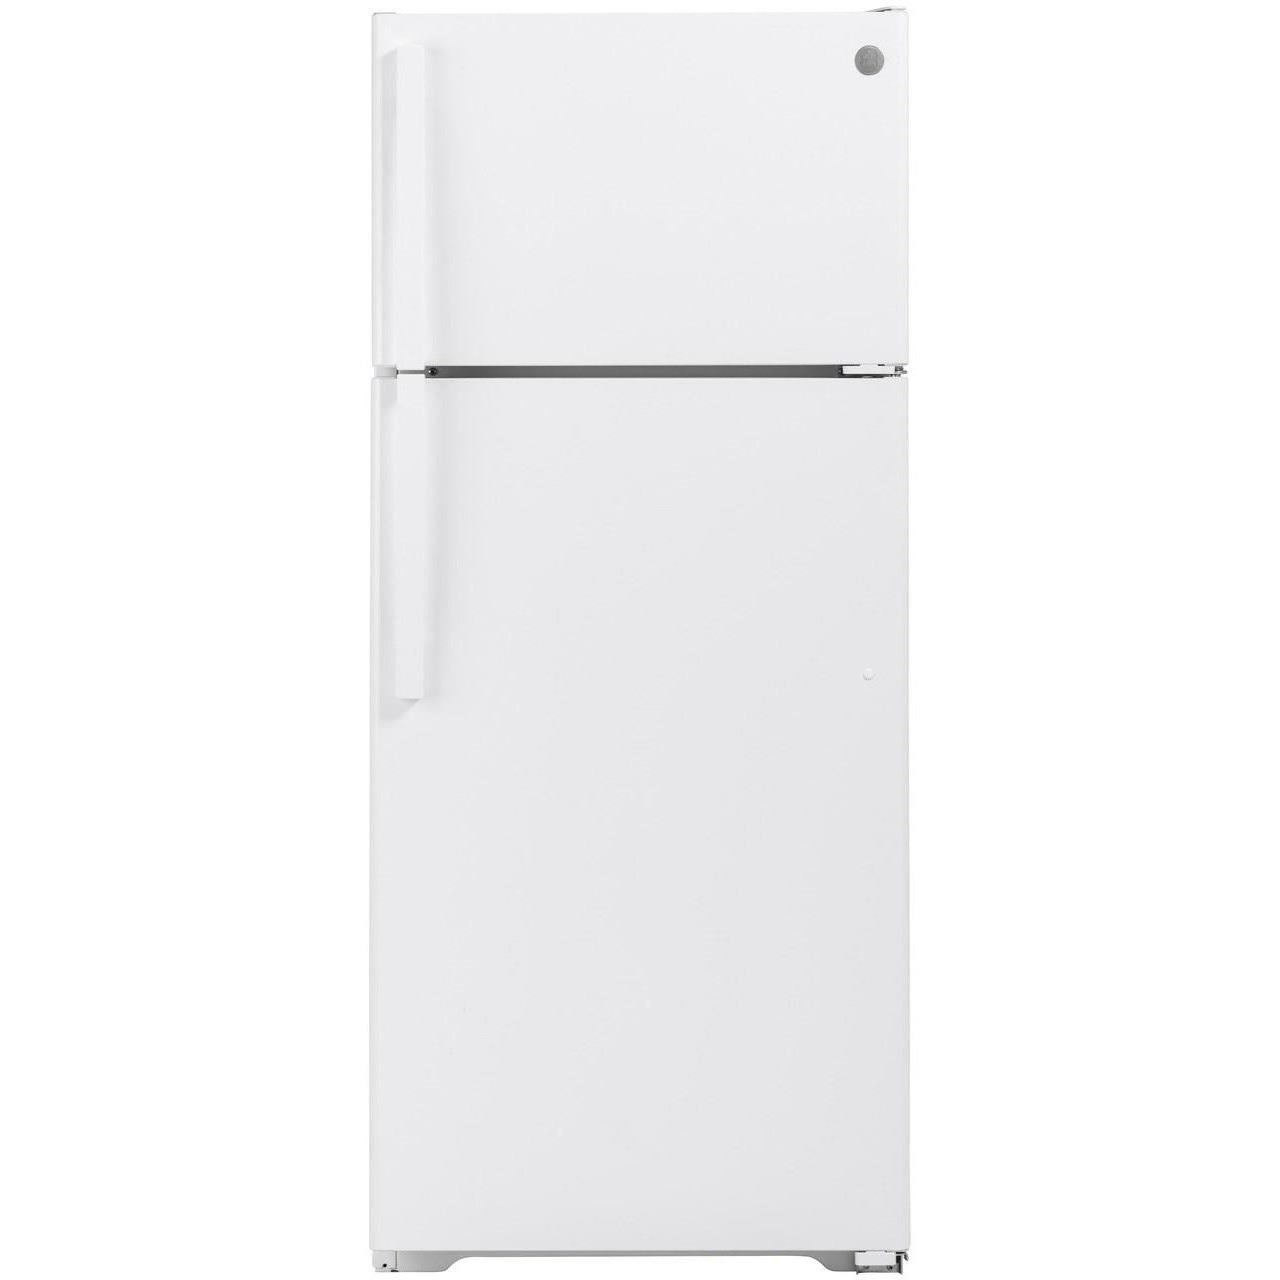 GE Top-Freezer Refrigerators GE® 17.5 Cu. Ft. Top-Freezer Refrigerator by GE Appliances at VanDrie Home Furnishings